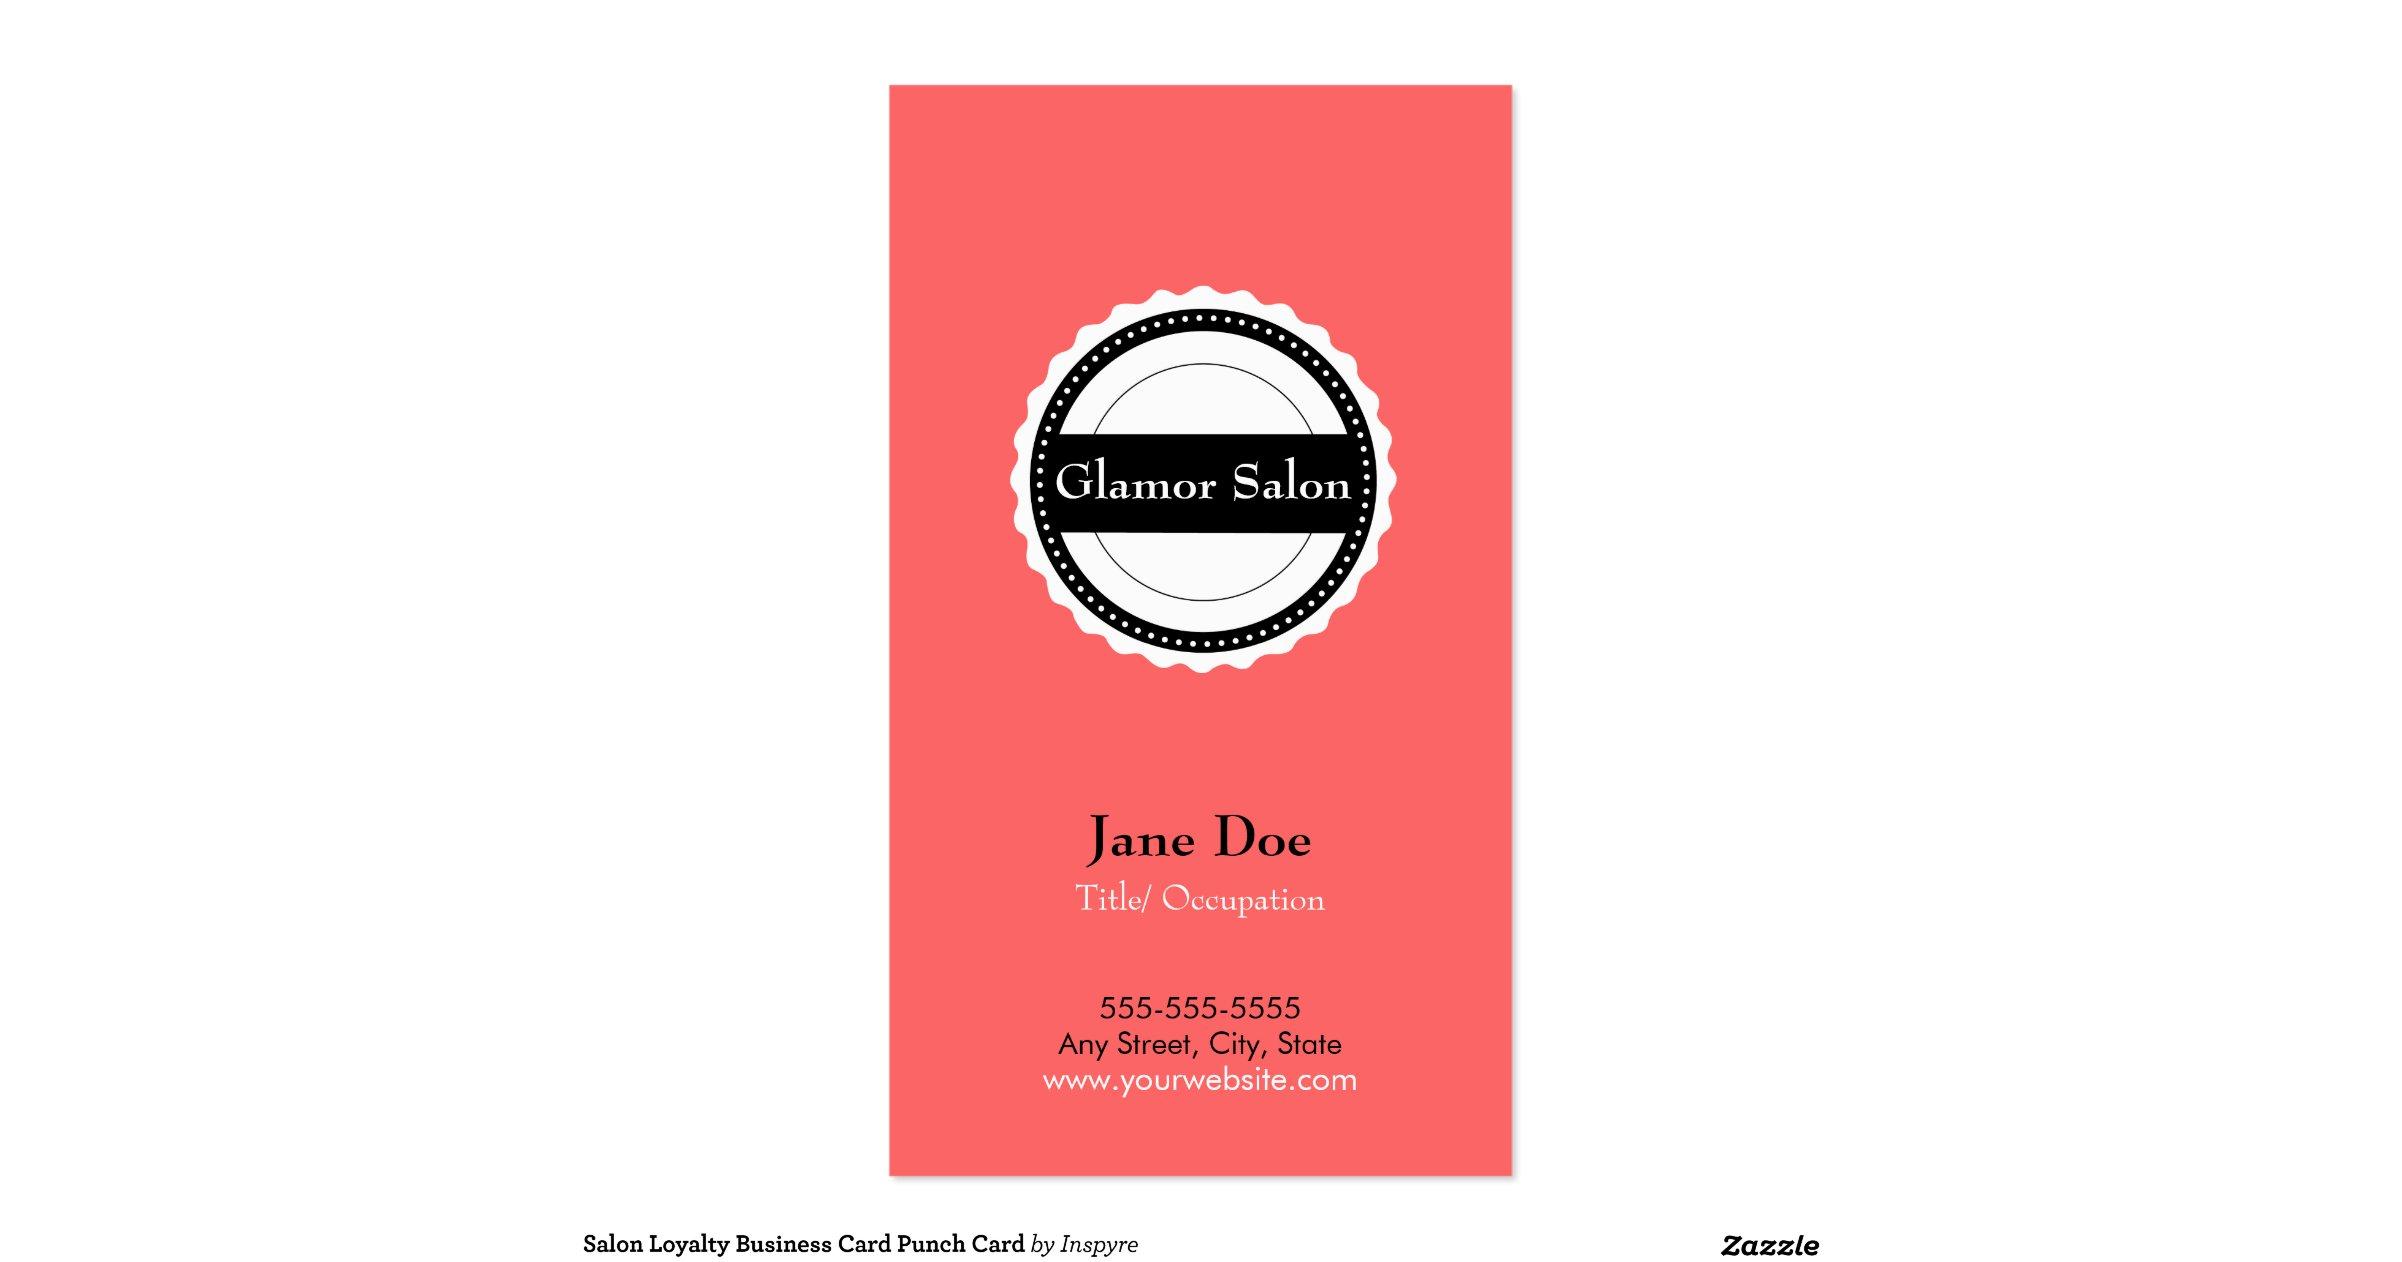 Salonloyaltybusinesscardpunchcard